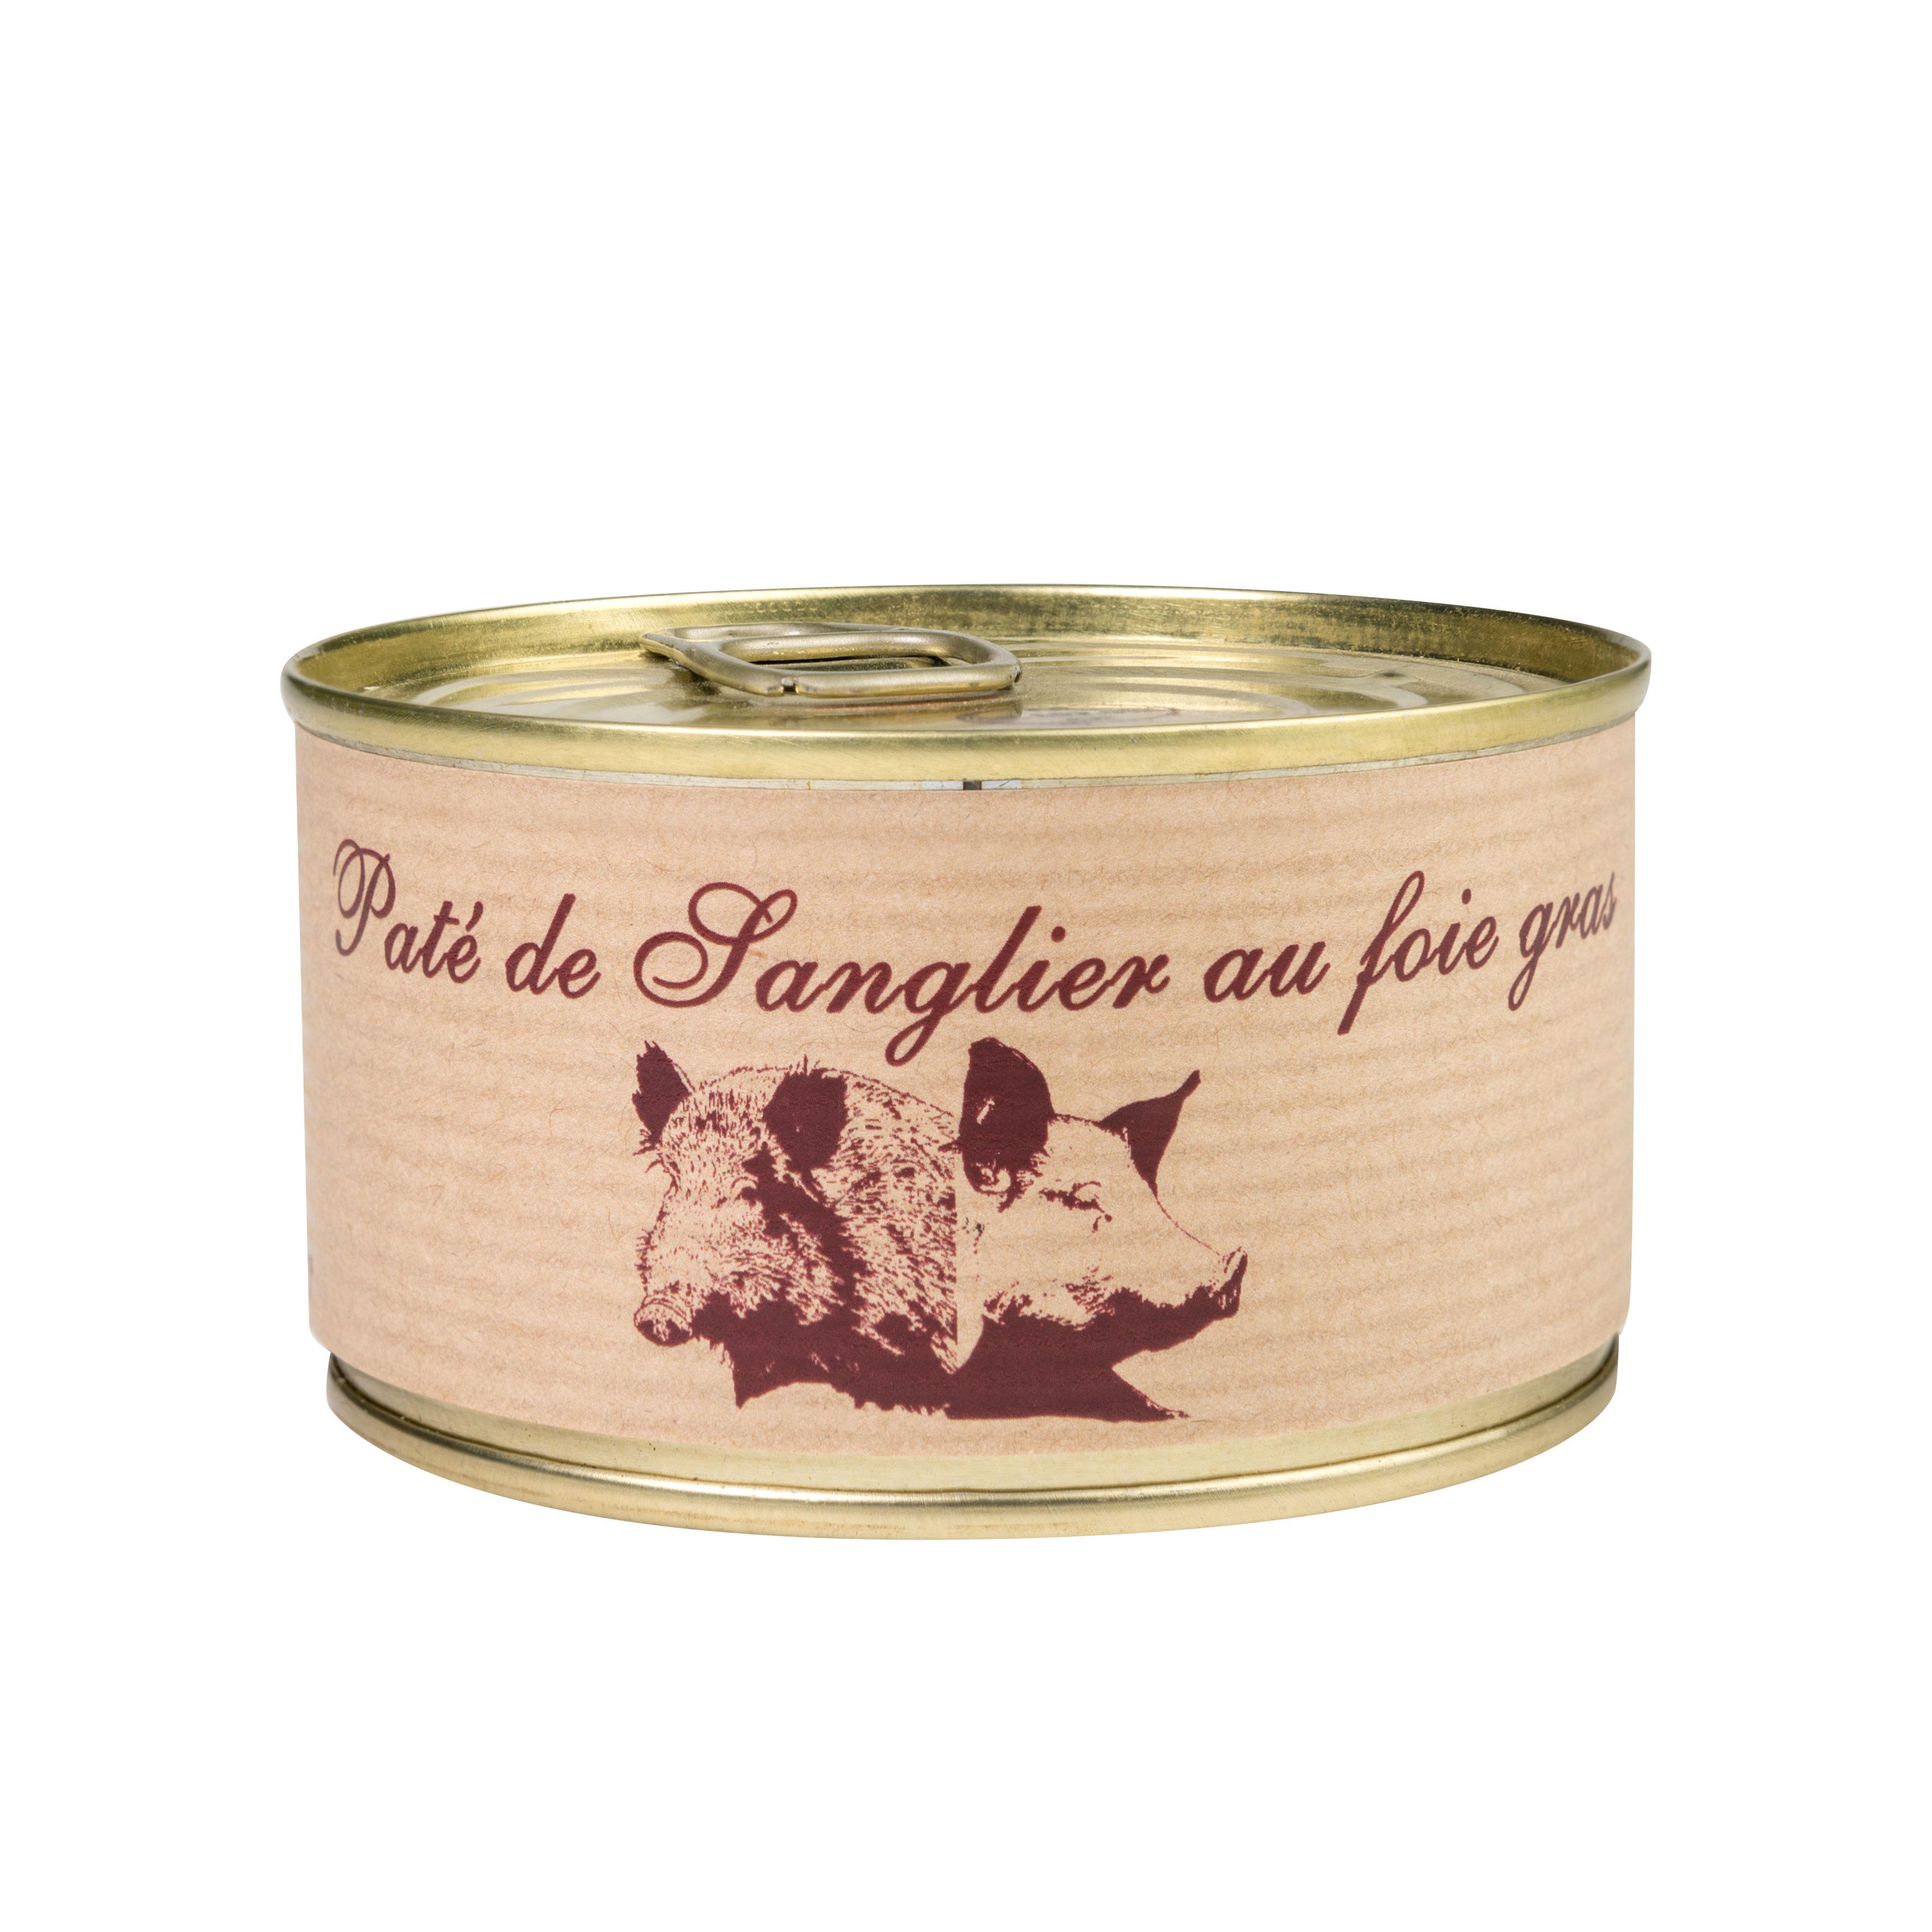 Pate sanglier foie gras